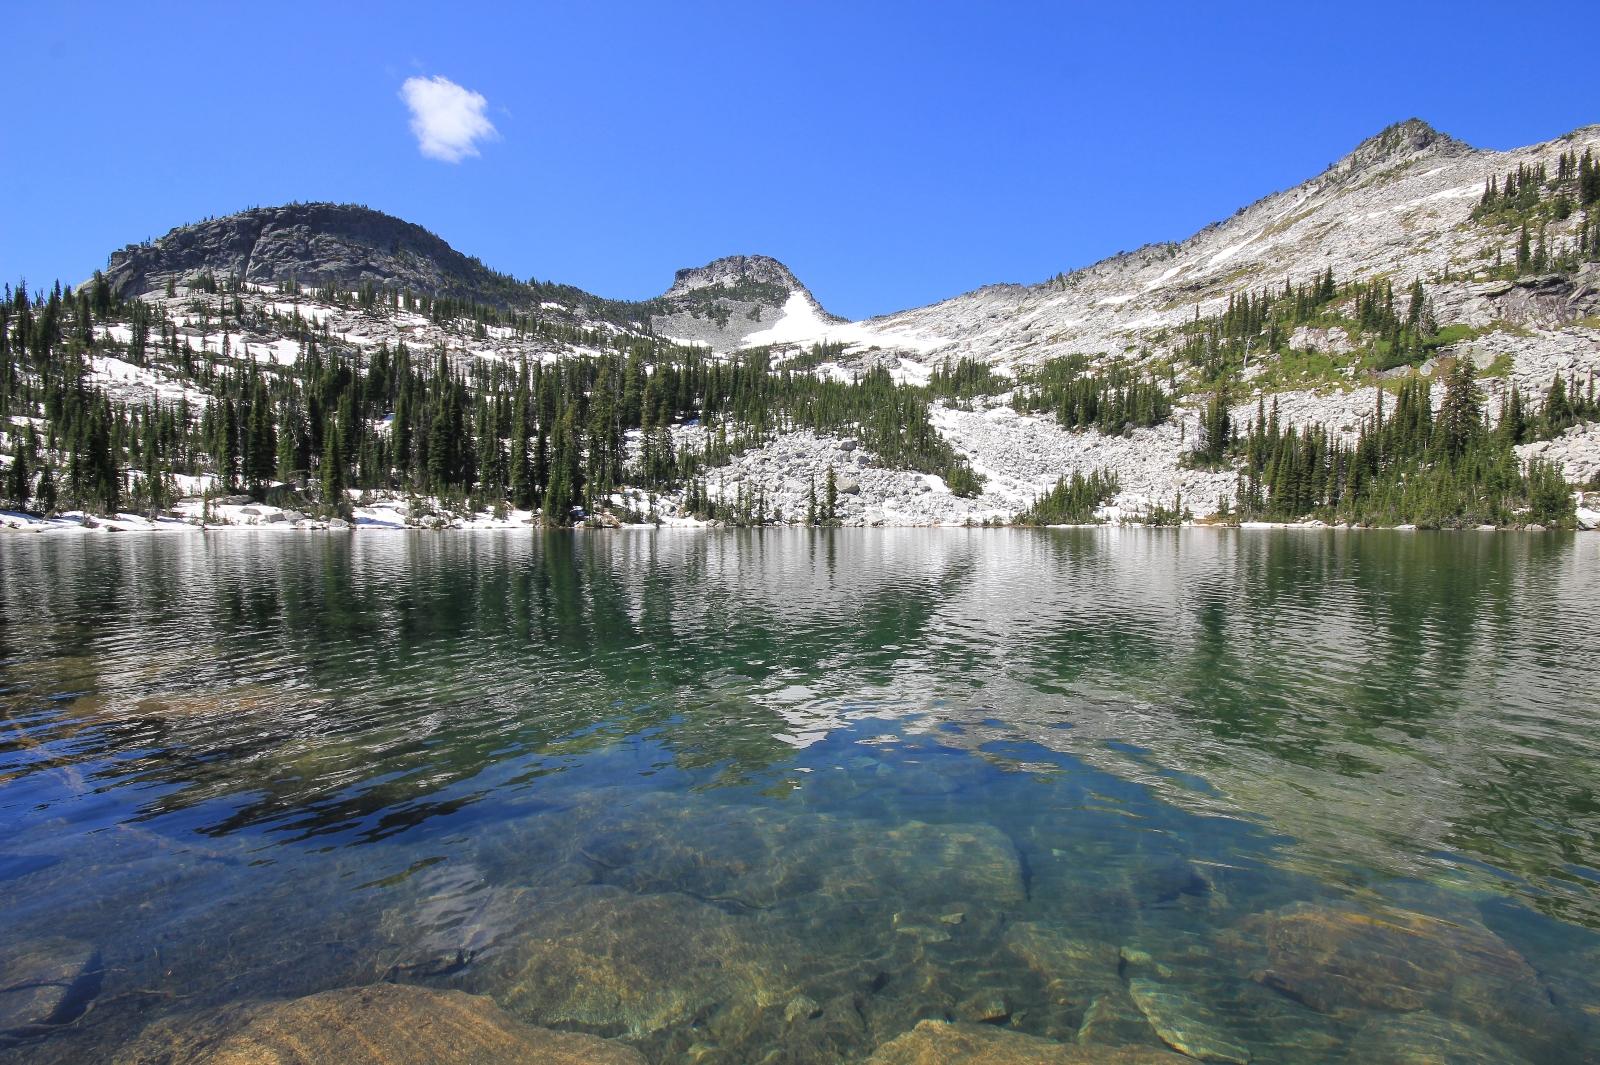 07-07-13 Beehike Lake Hike (32)